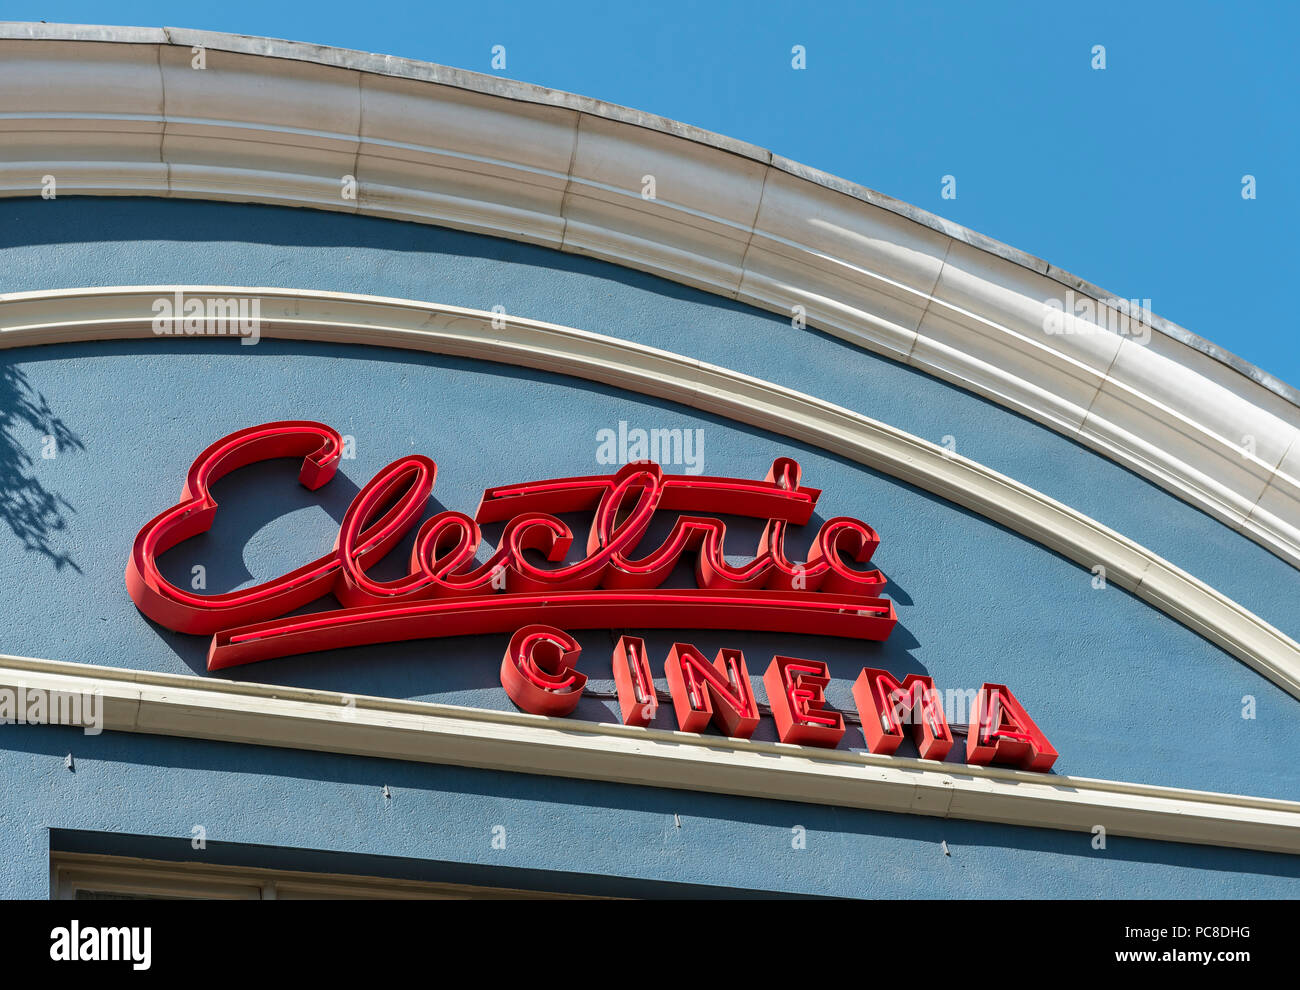 Electric Cinema neon sign, Portobello Road, Notting Hill, London, UK - Stock Image